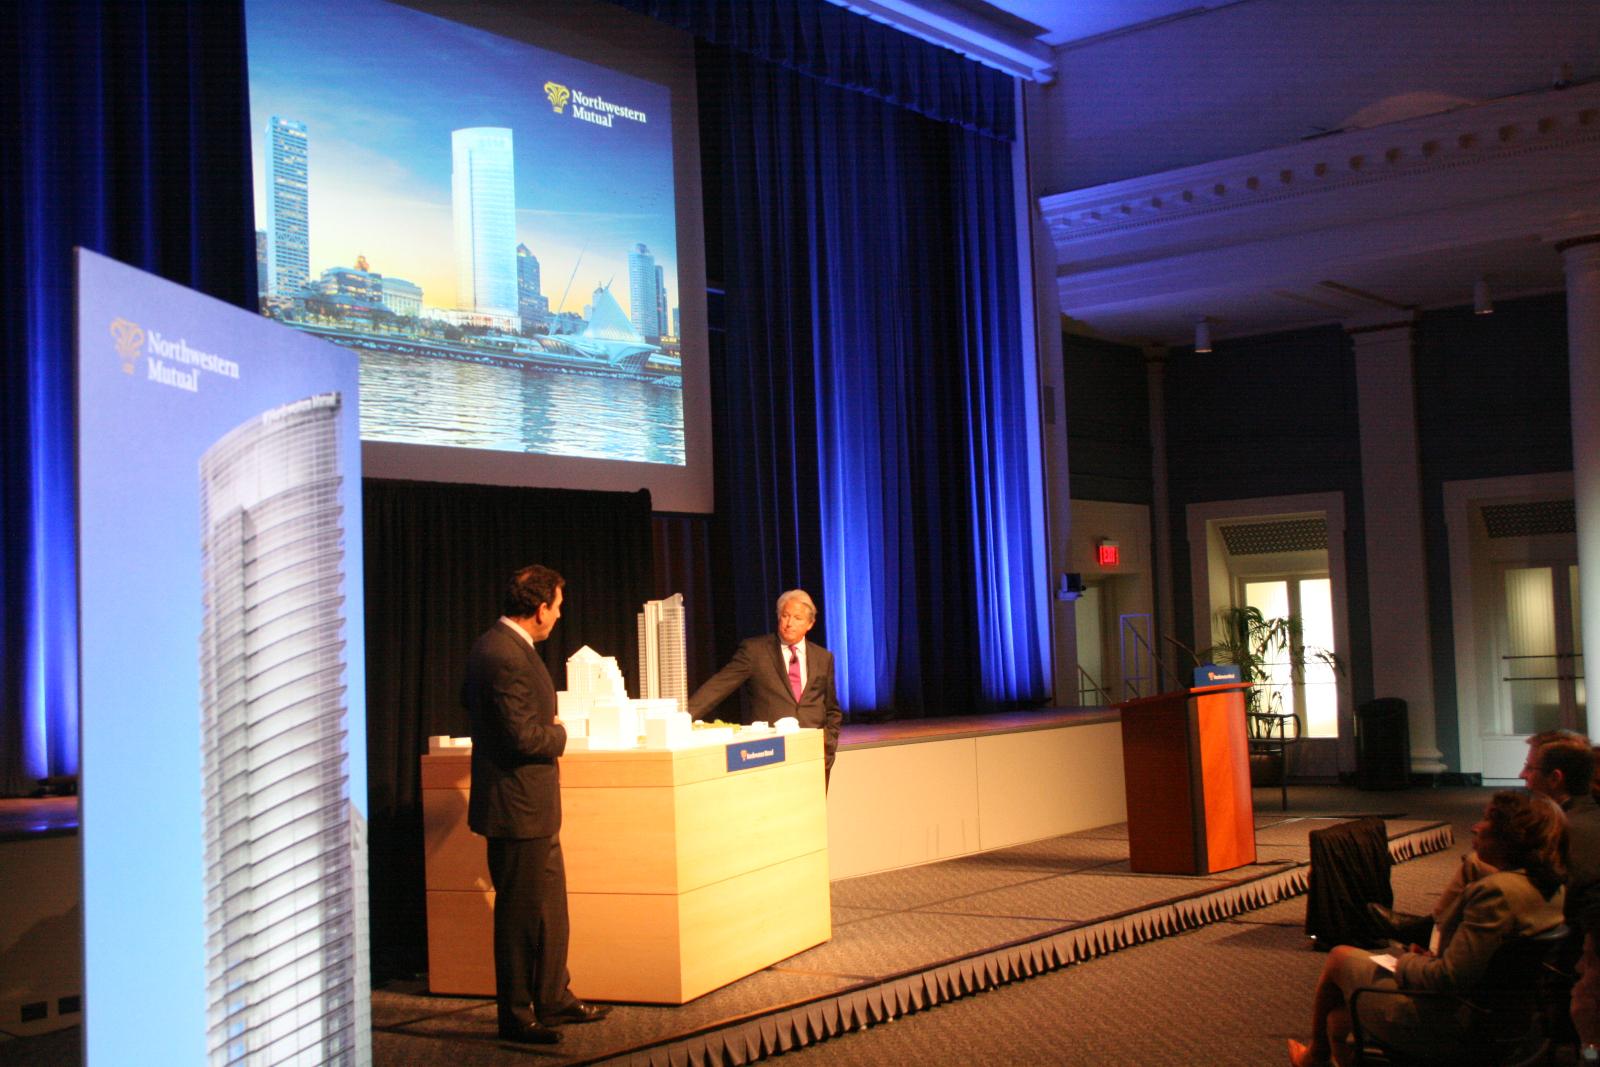 CEO John Schlifske and Jon Pickard look at the building model.